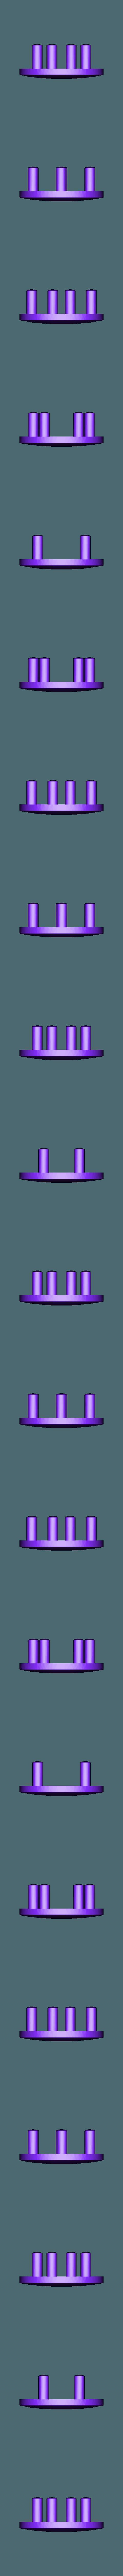 parte tampa.STL Download STL file mirror support • 3D printer object, Paulocnc